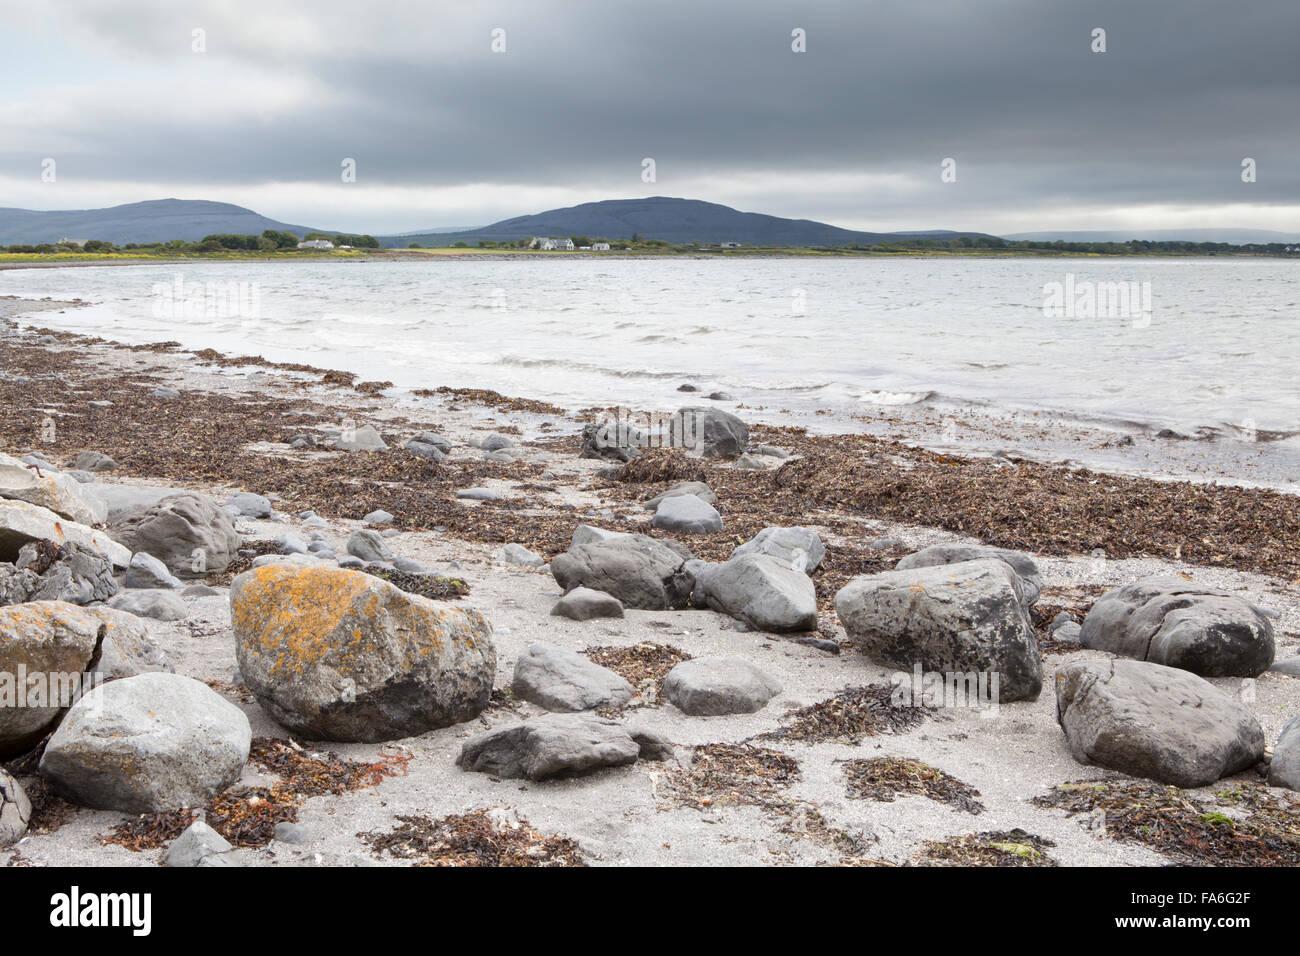 The west coast of Ireland near Flaggy Shore - Stock Image